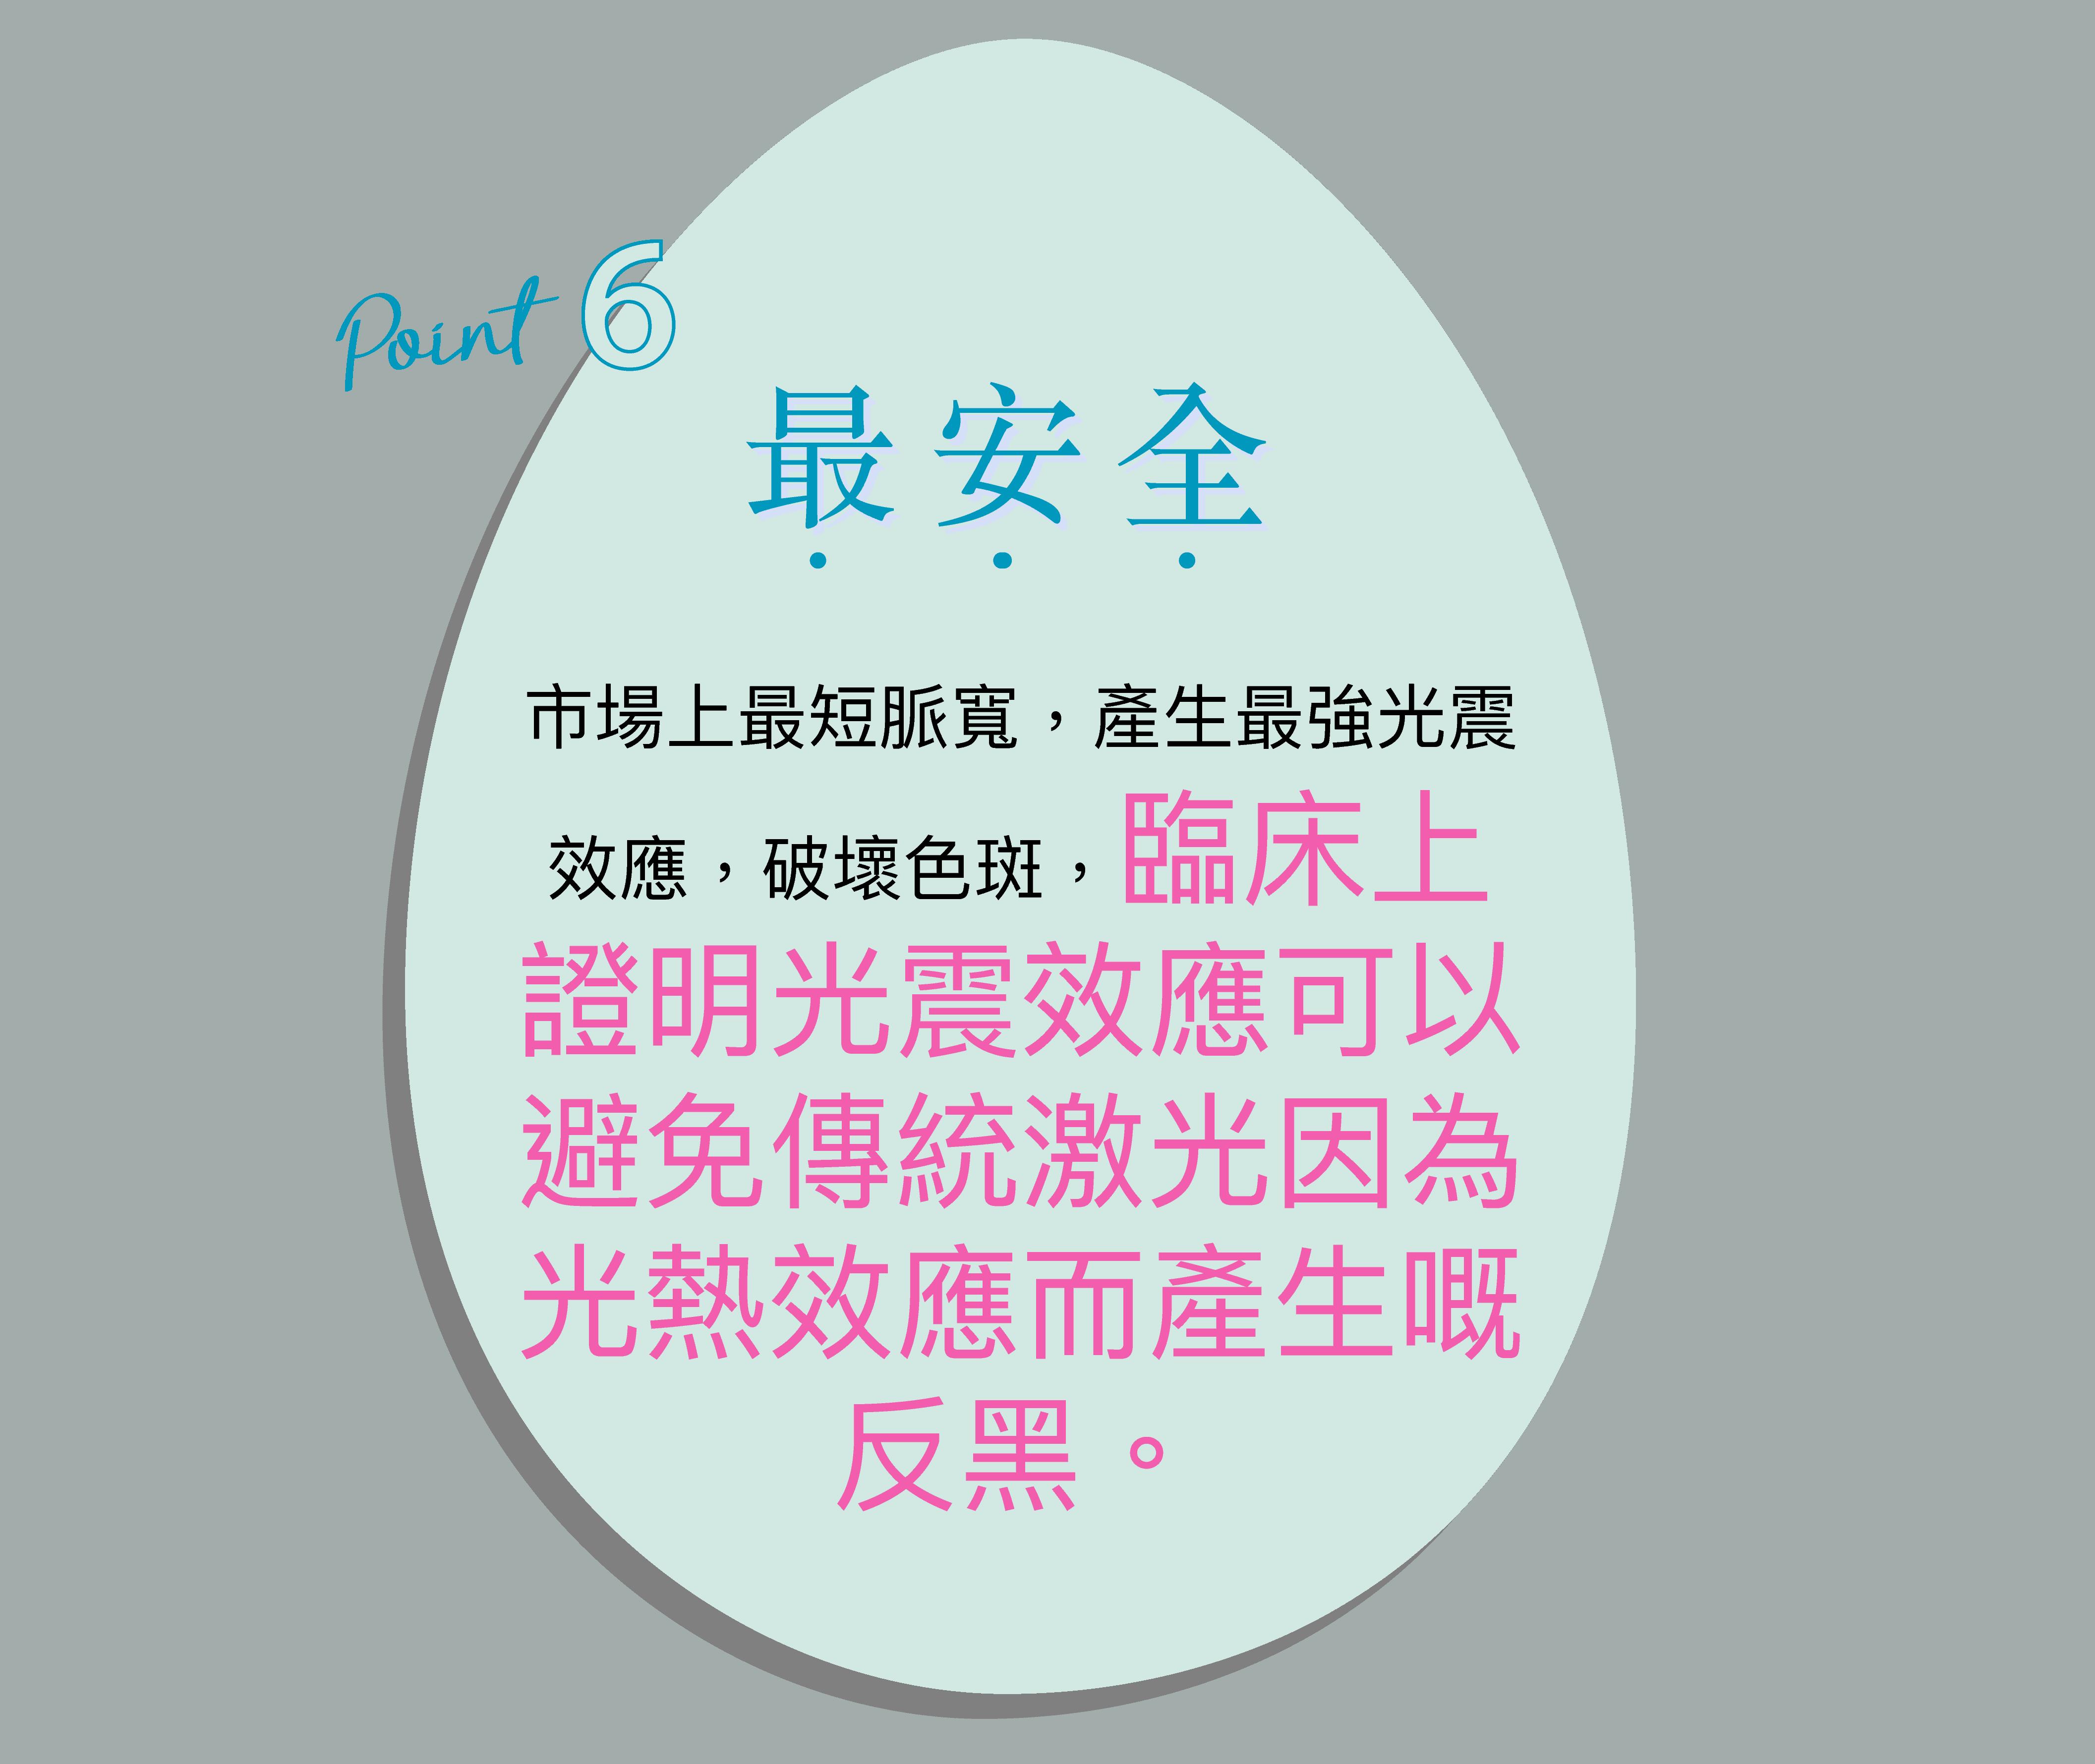 picoway_n02 Pico banner update egg 03 mobile 30